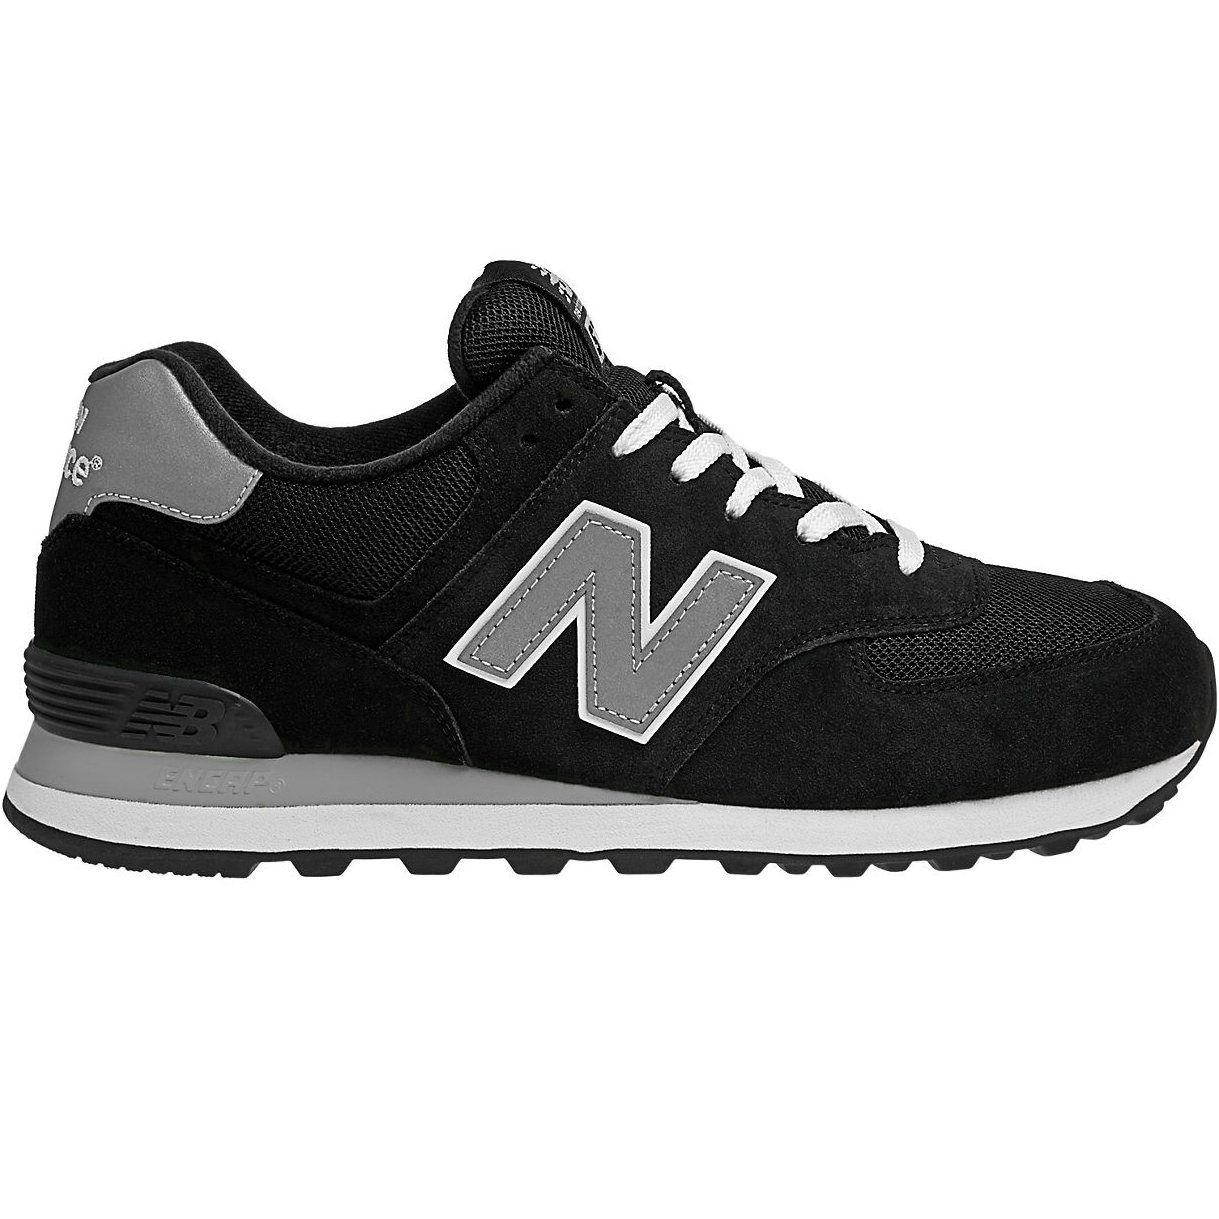 New Balance M574 Schwarze Sneaker Nike Schwarz Damen Sneaker Herren